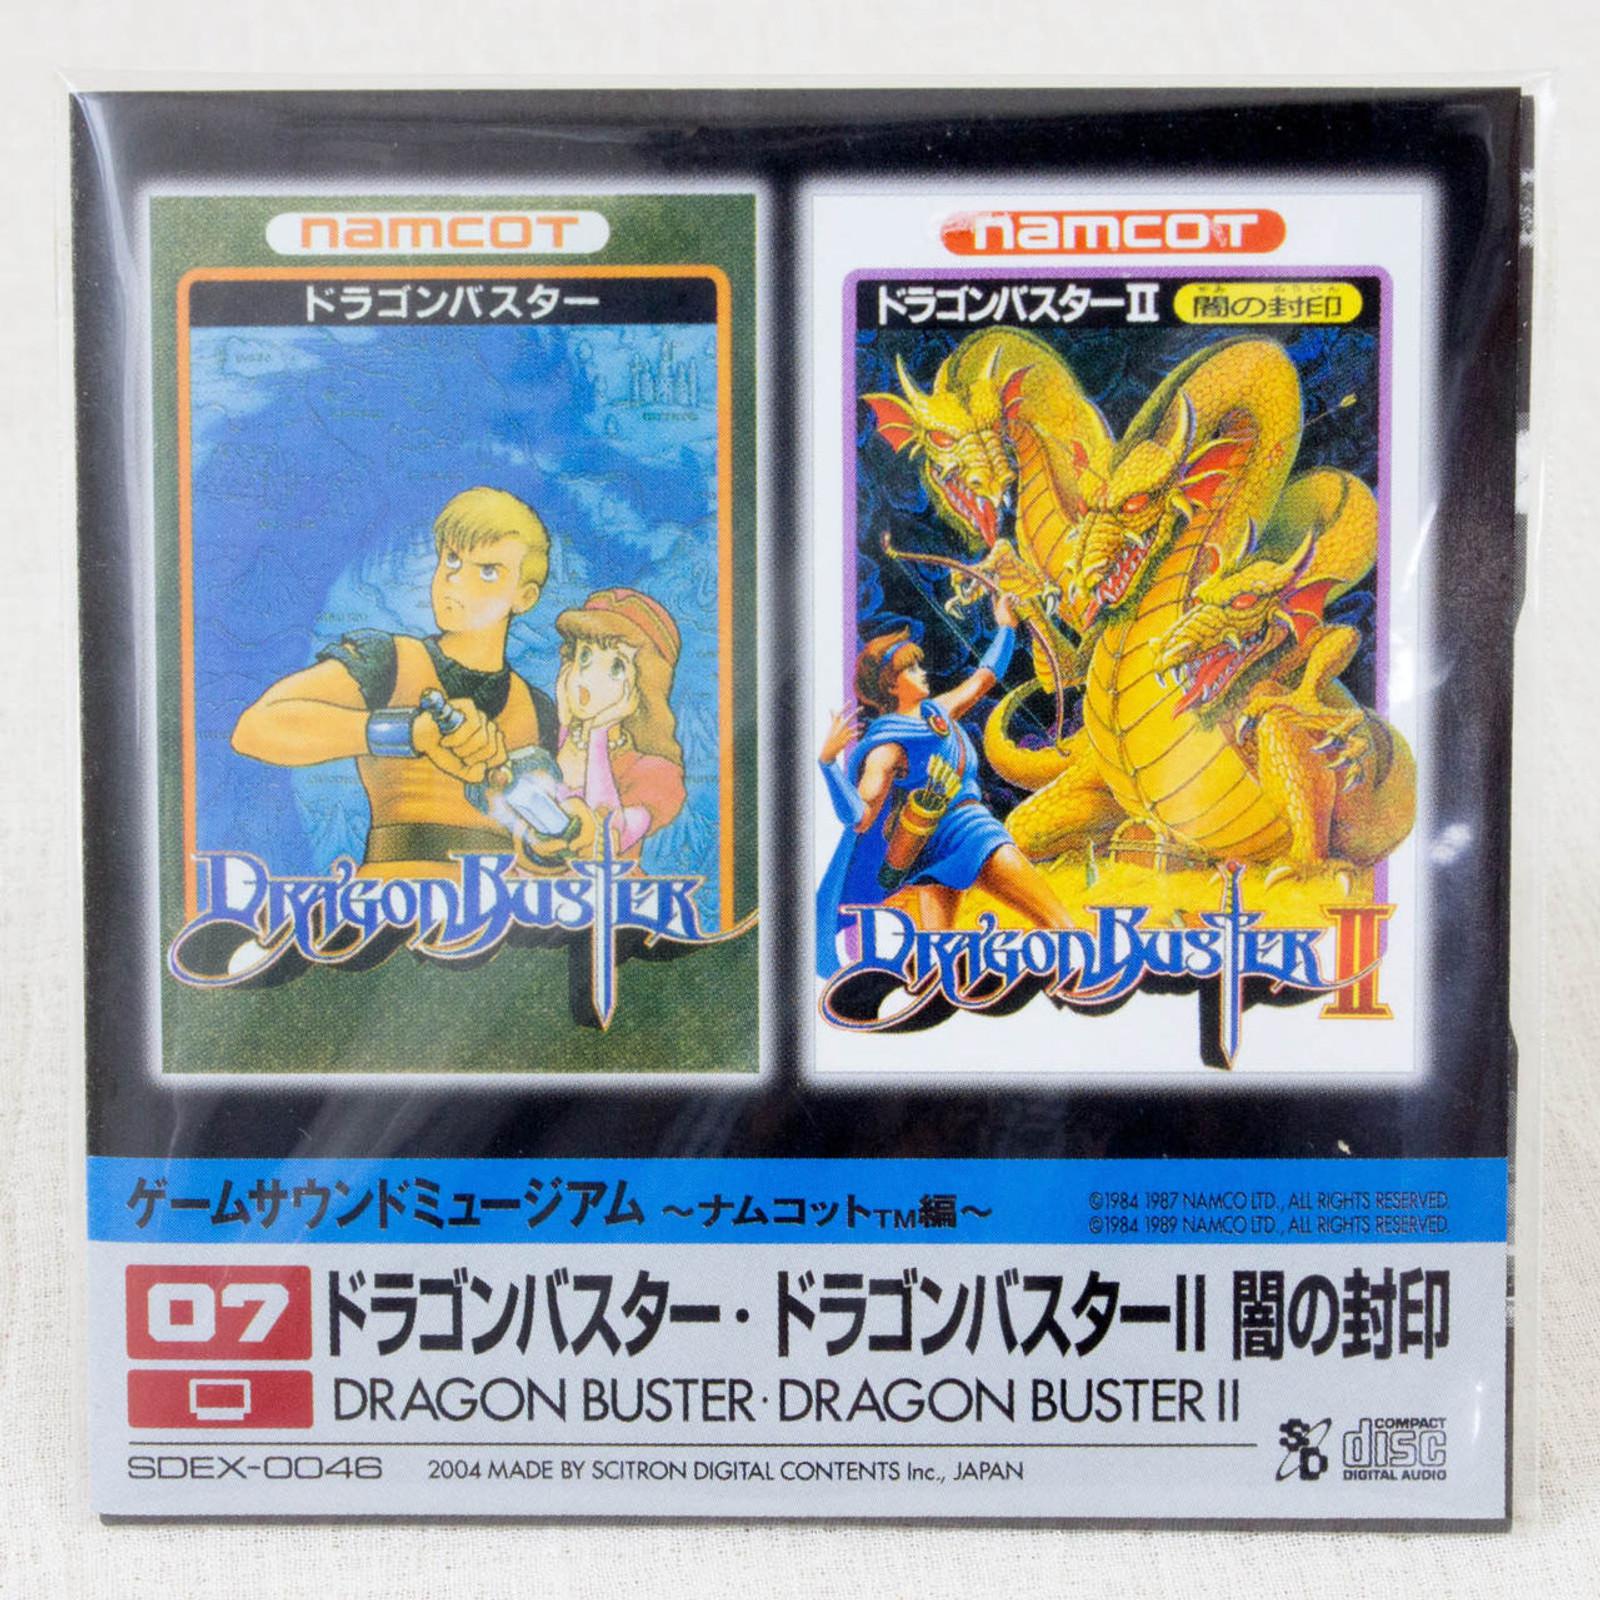 Dragon Buster Game Sound Museum Namco #07 Music 8cm CD JAPAN FAMICOM NINTNEDO